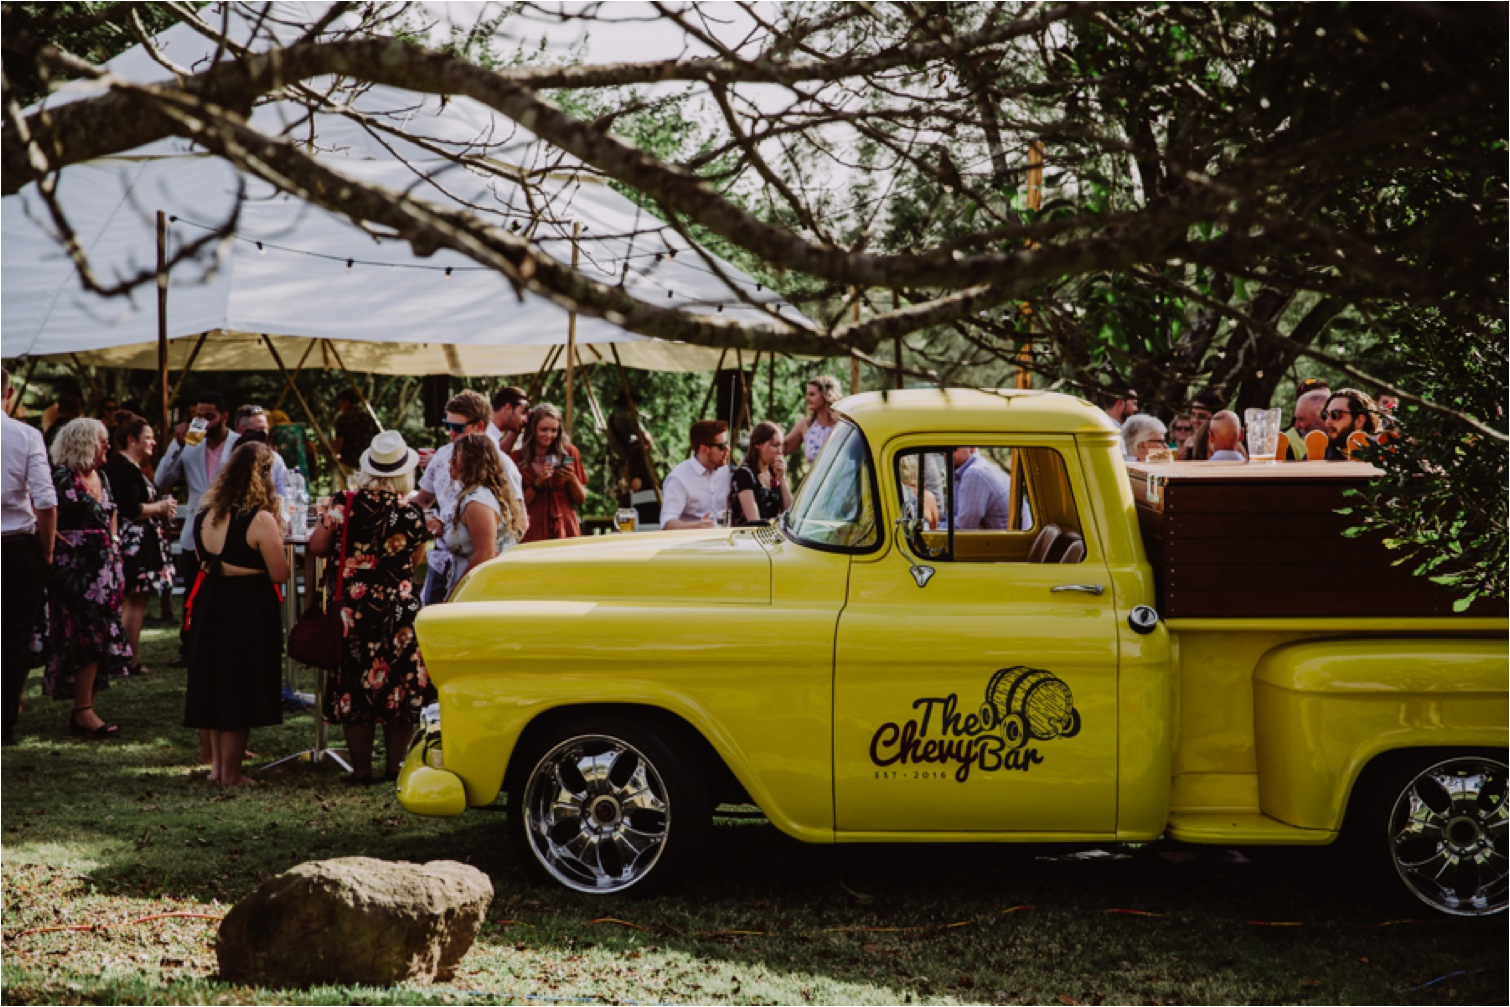 The Chevy Bar wedding